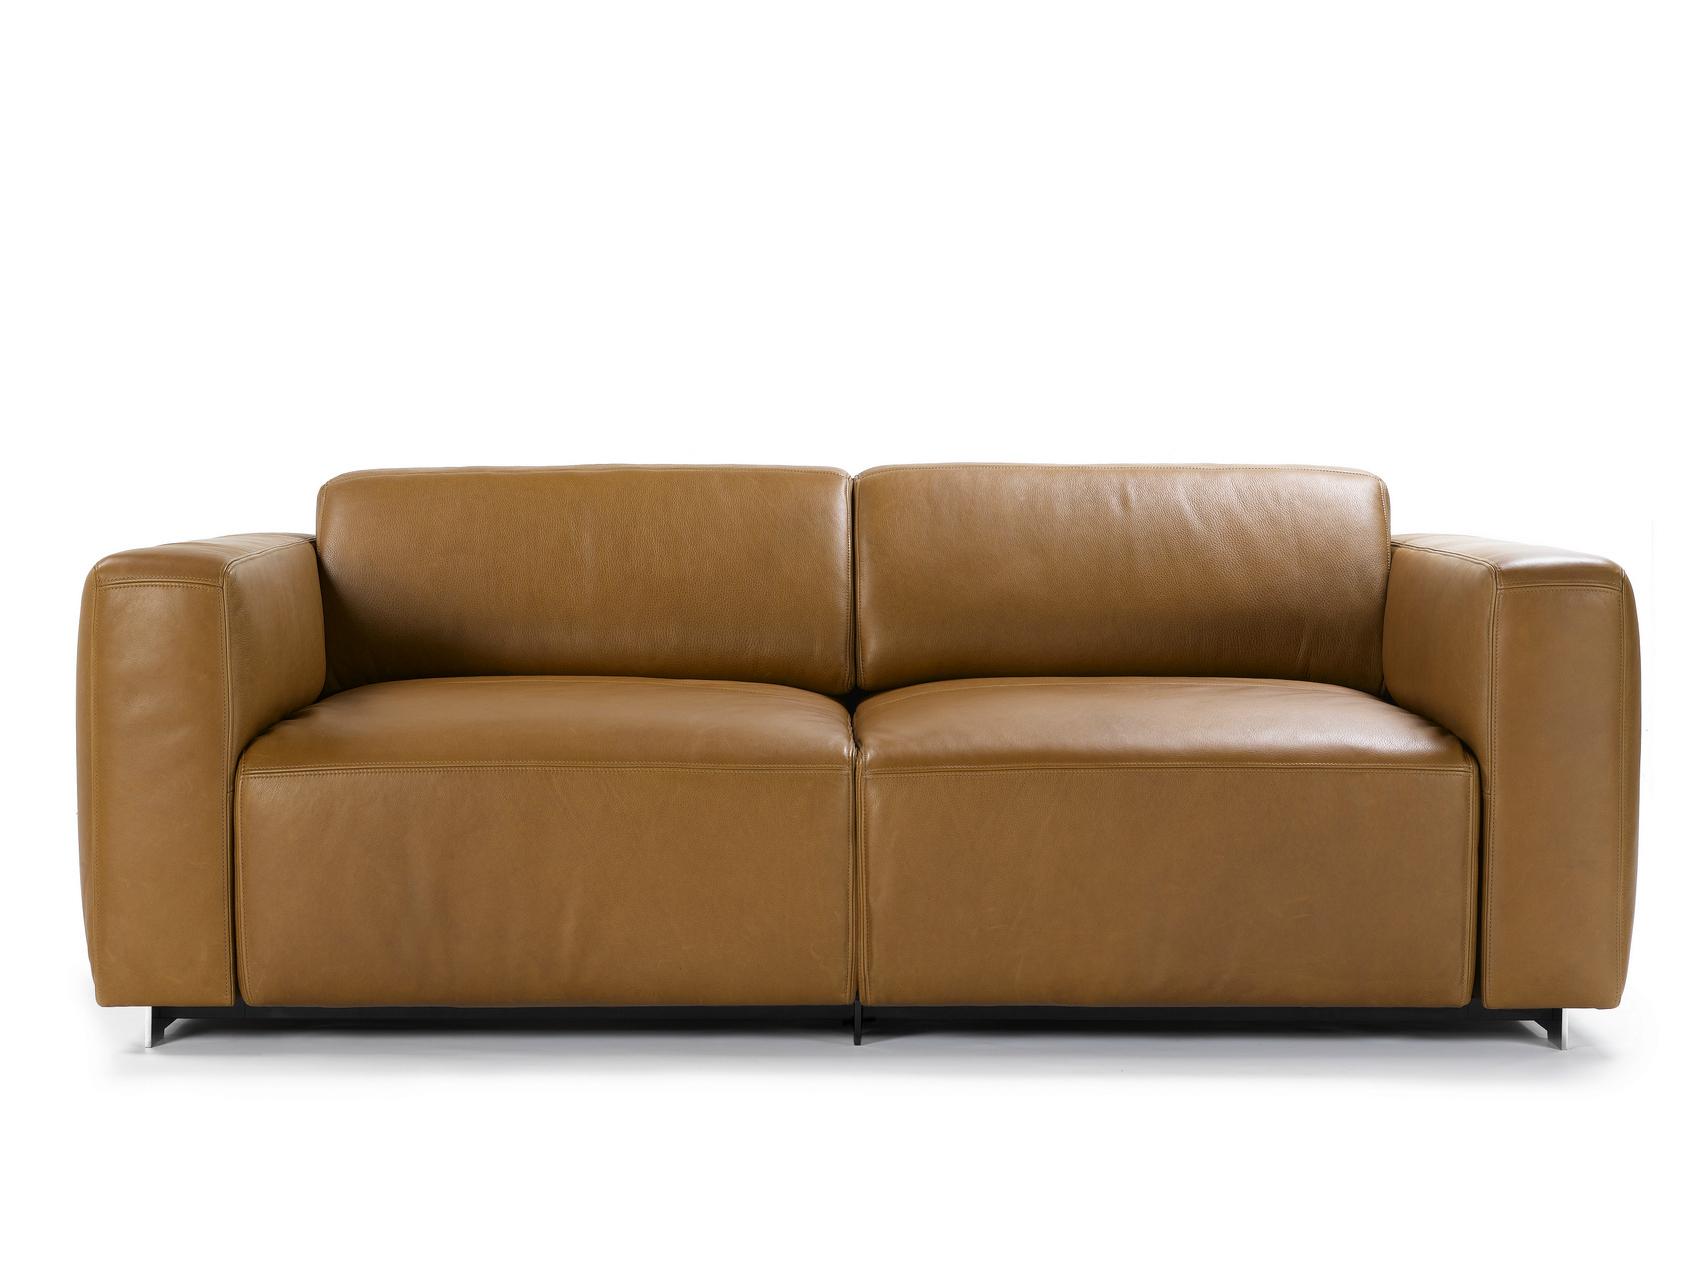 Super Long Island Sofa By Kai Stania For Durlet Sohomod Blog Spiritservingveterans Wood Chair Design Ideas Spiritservingveteransorg